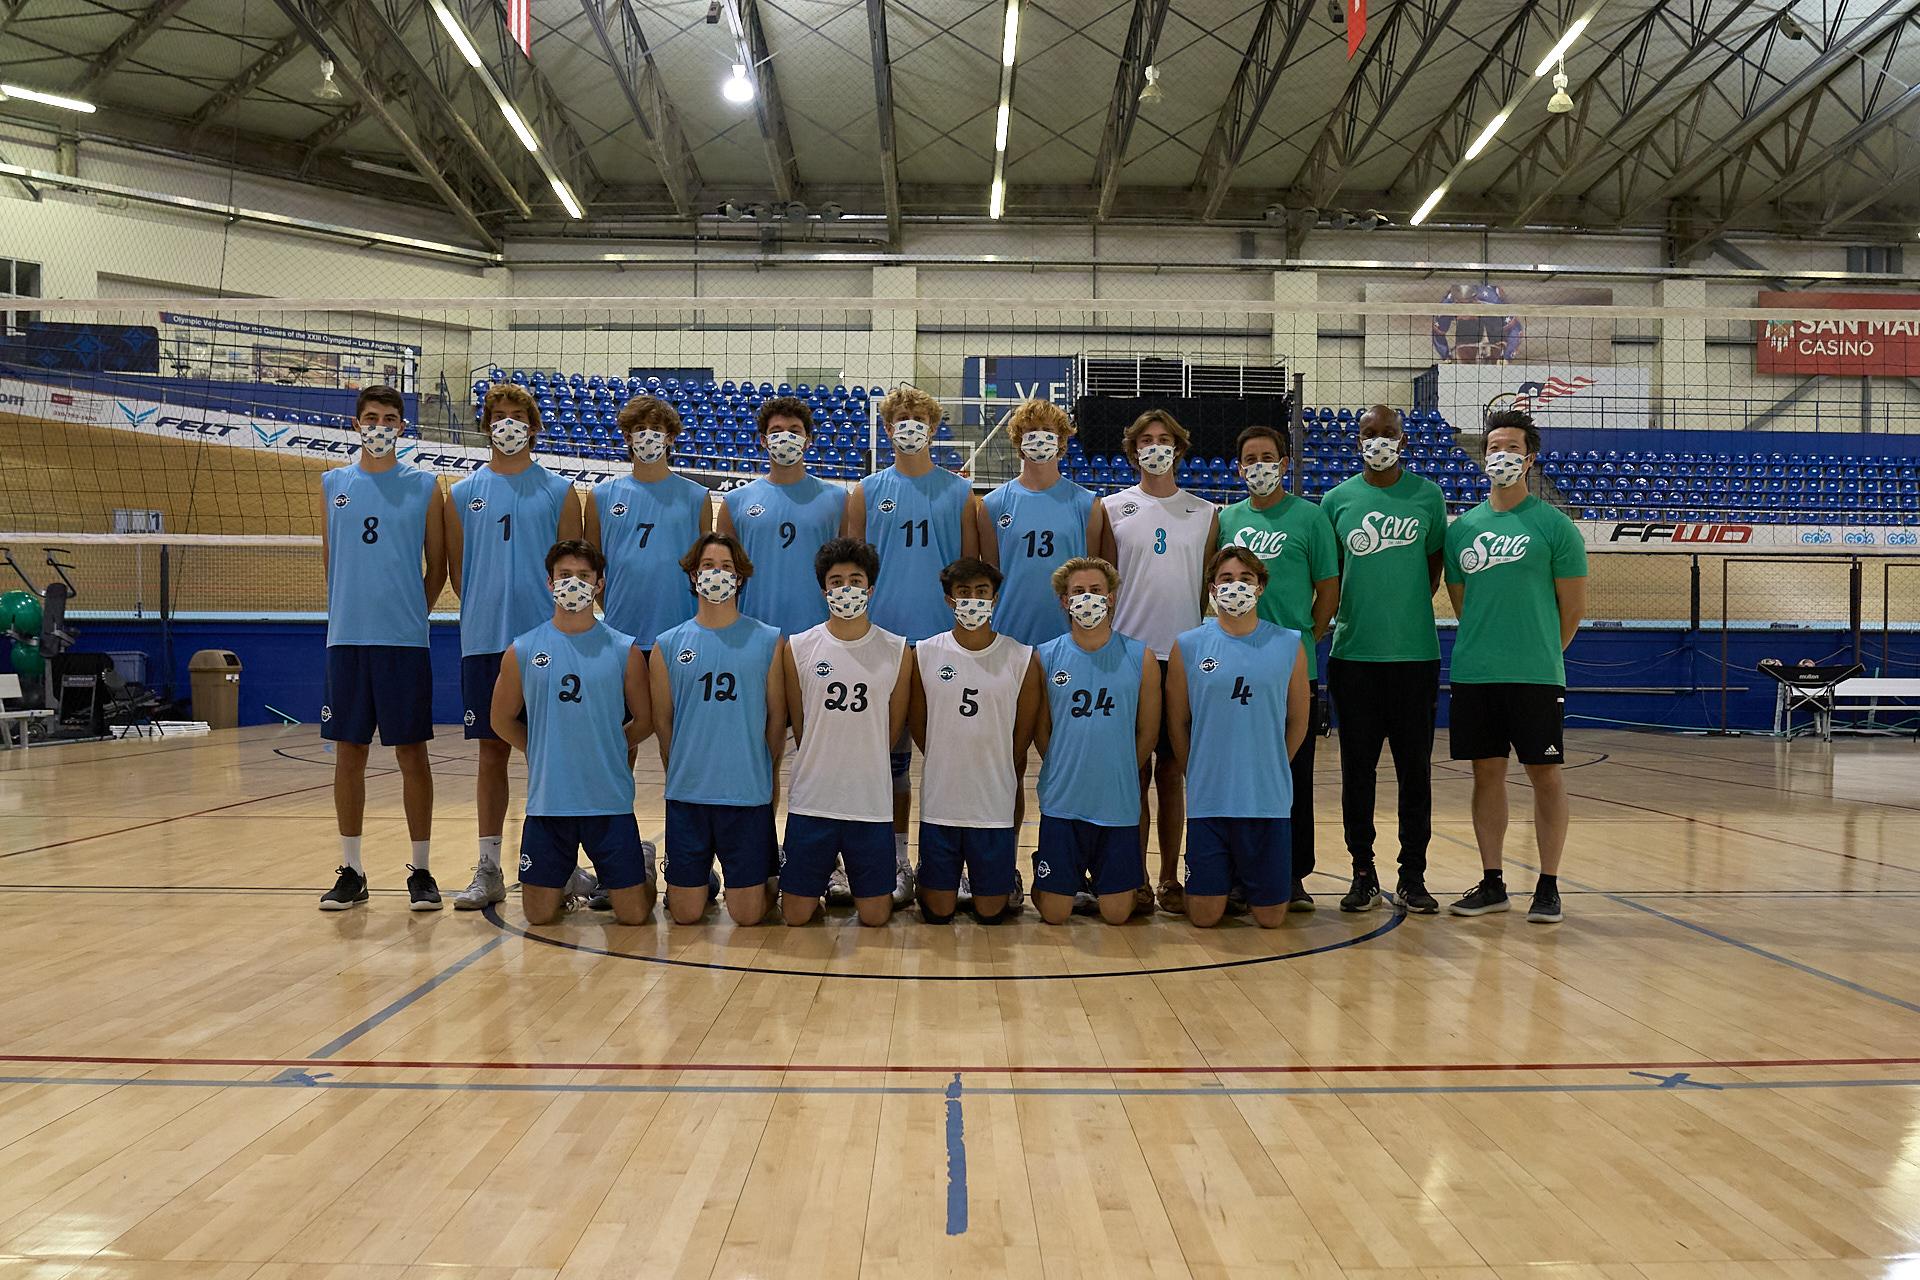 SCVC 18 Quiksilver Team